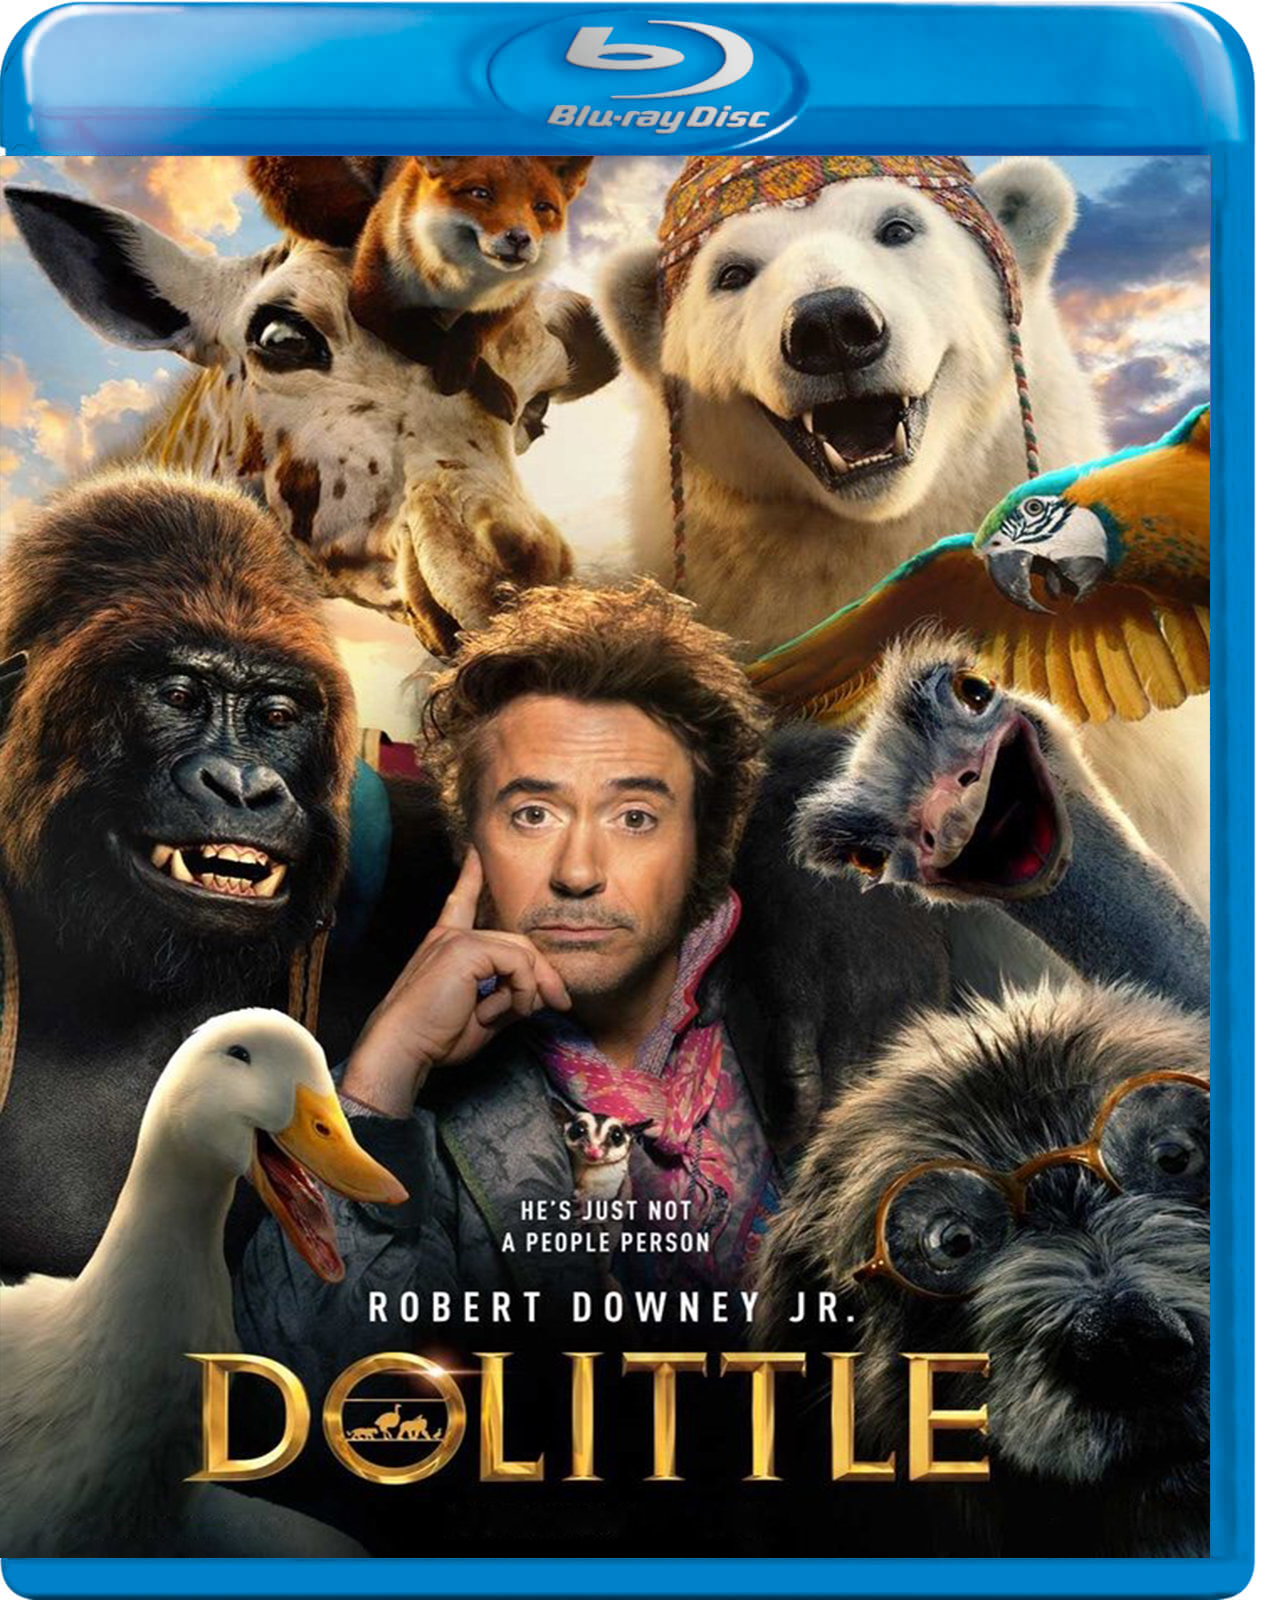 Dolittle [2019] [BD50] [Latino]